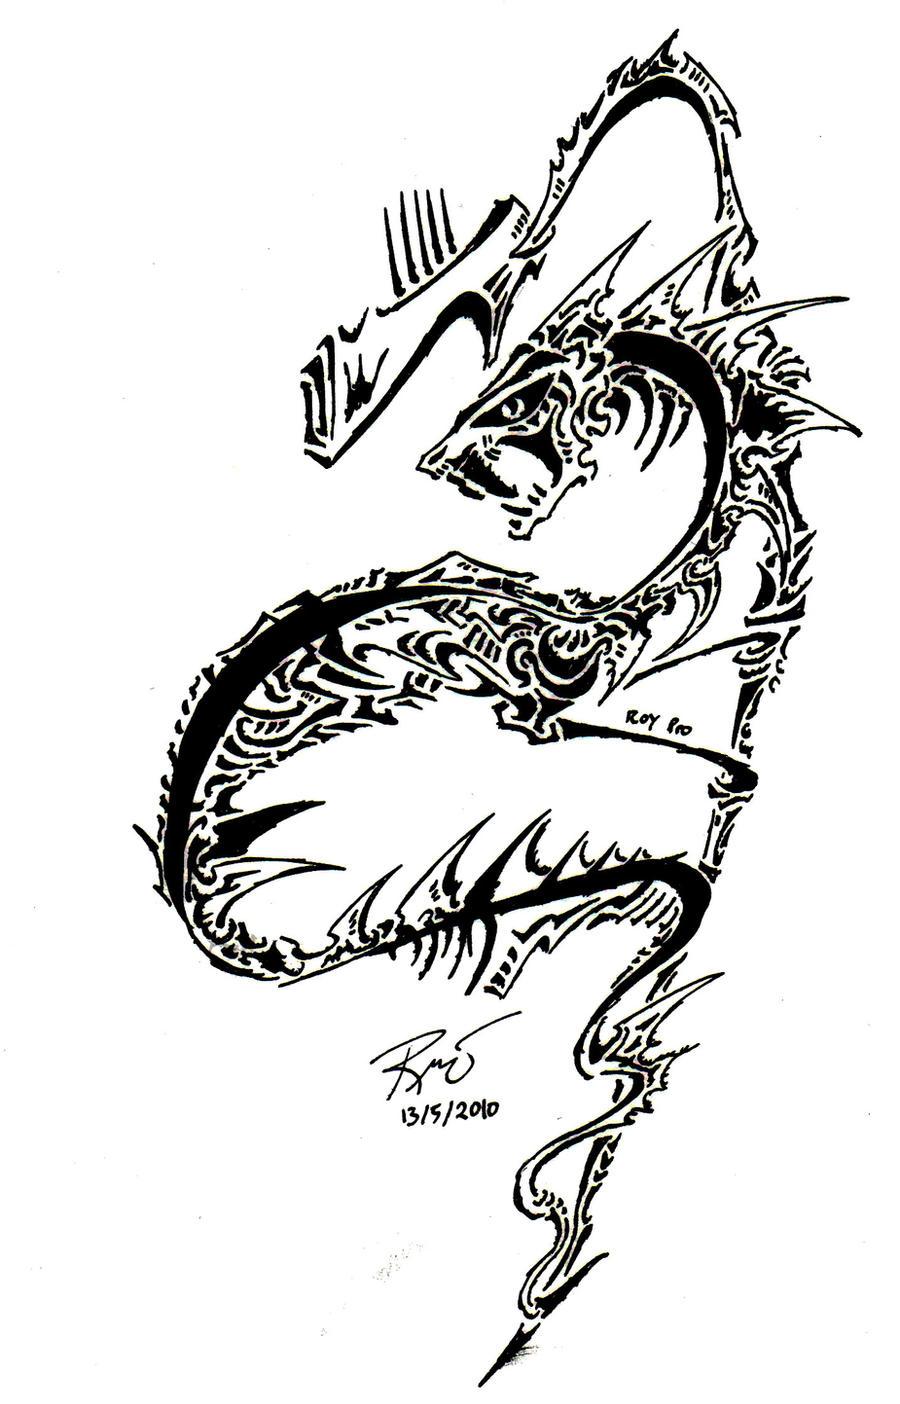 tribal serpent by roycorleone on deviantart